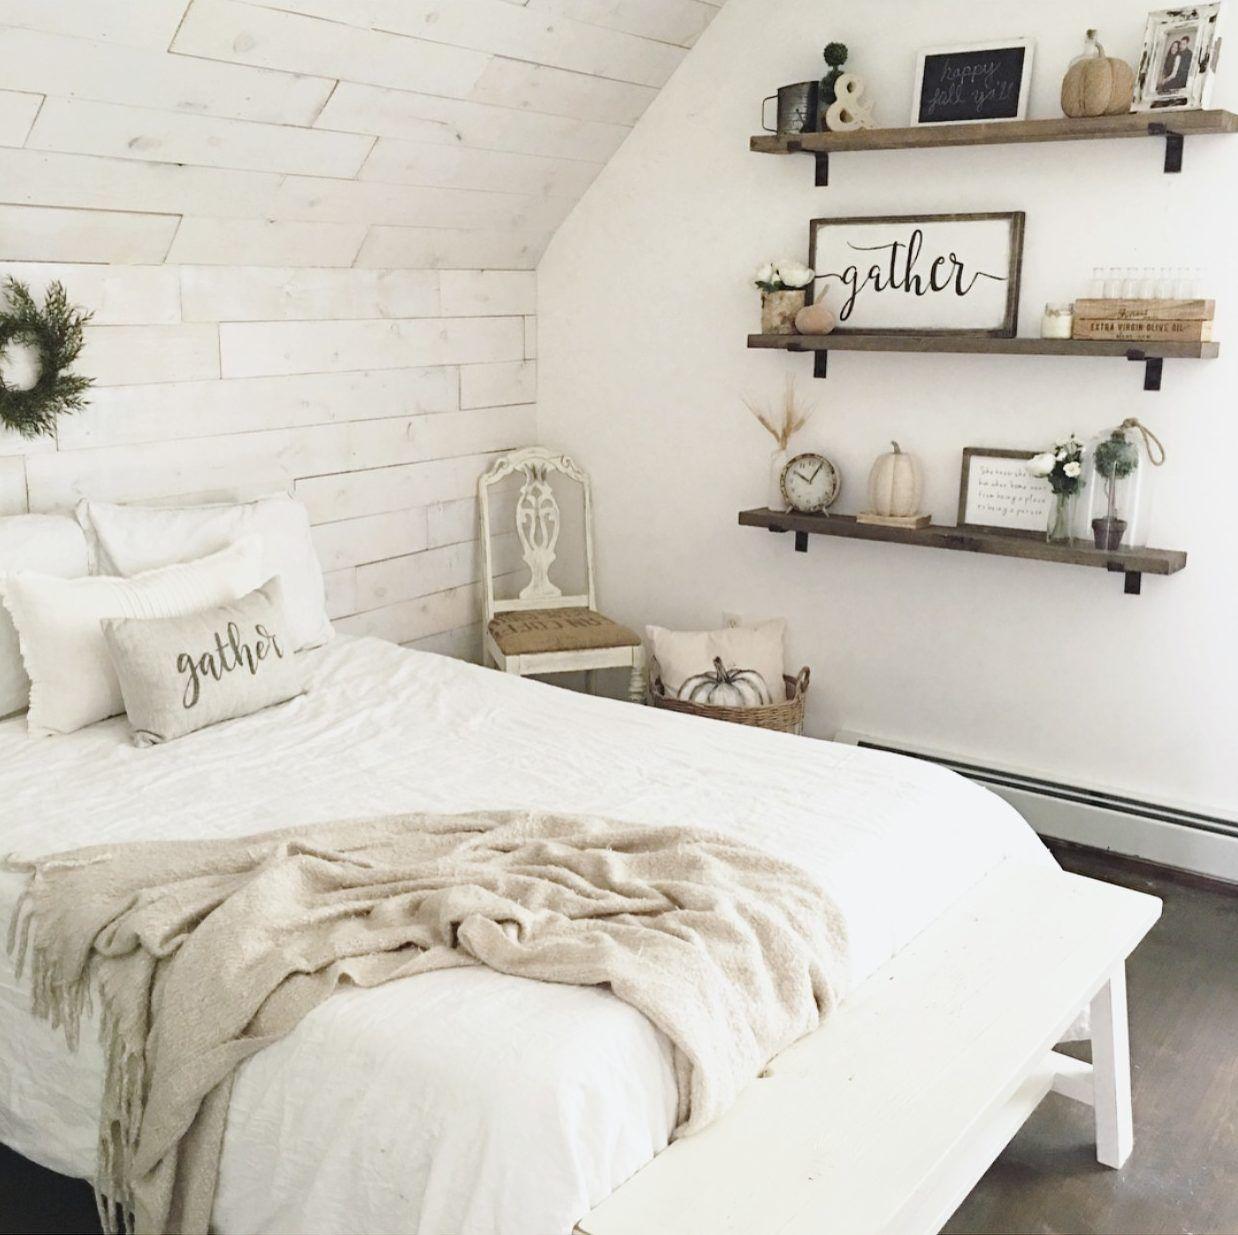 05 Modern Rustic Farmhouse Bedroom Ideas: Farmhouse Bedroom With Shiplap